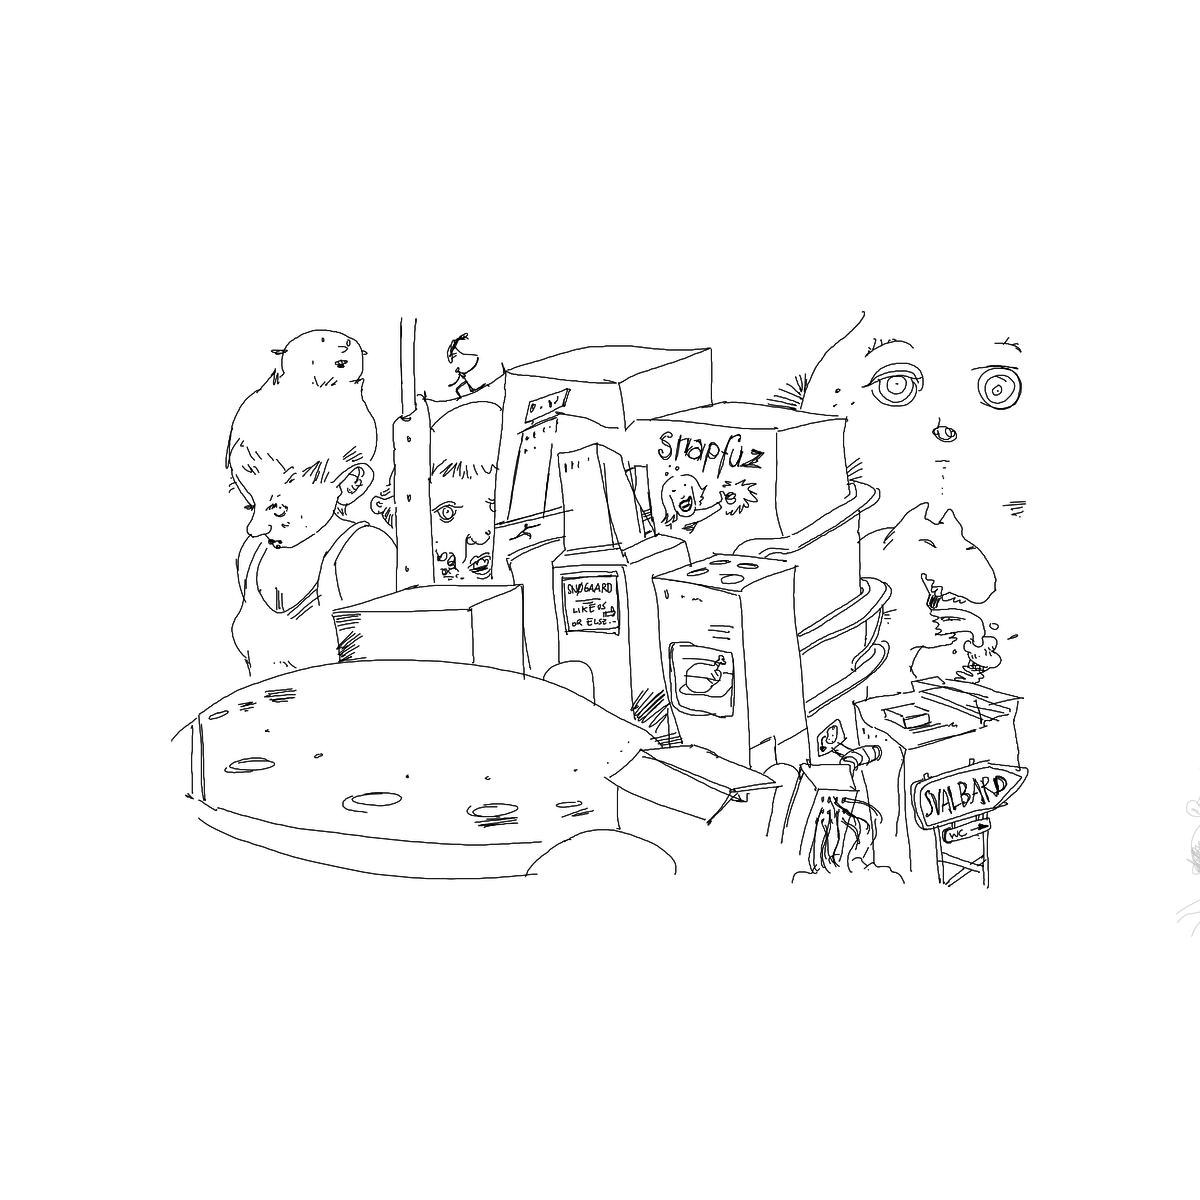 BAAAM drawing#3530 lat:40.7131729125976560lng: -74.0123825073242200